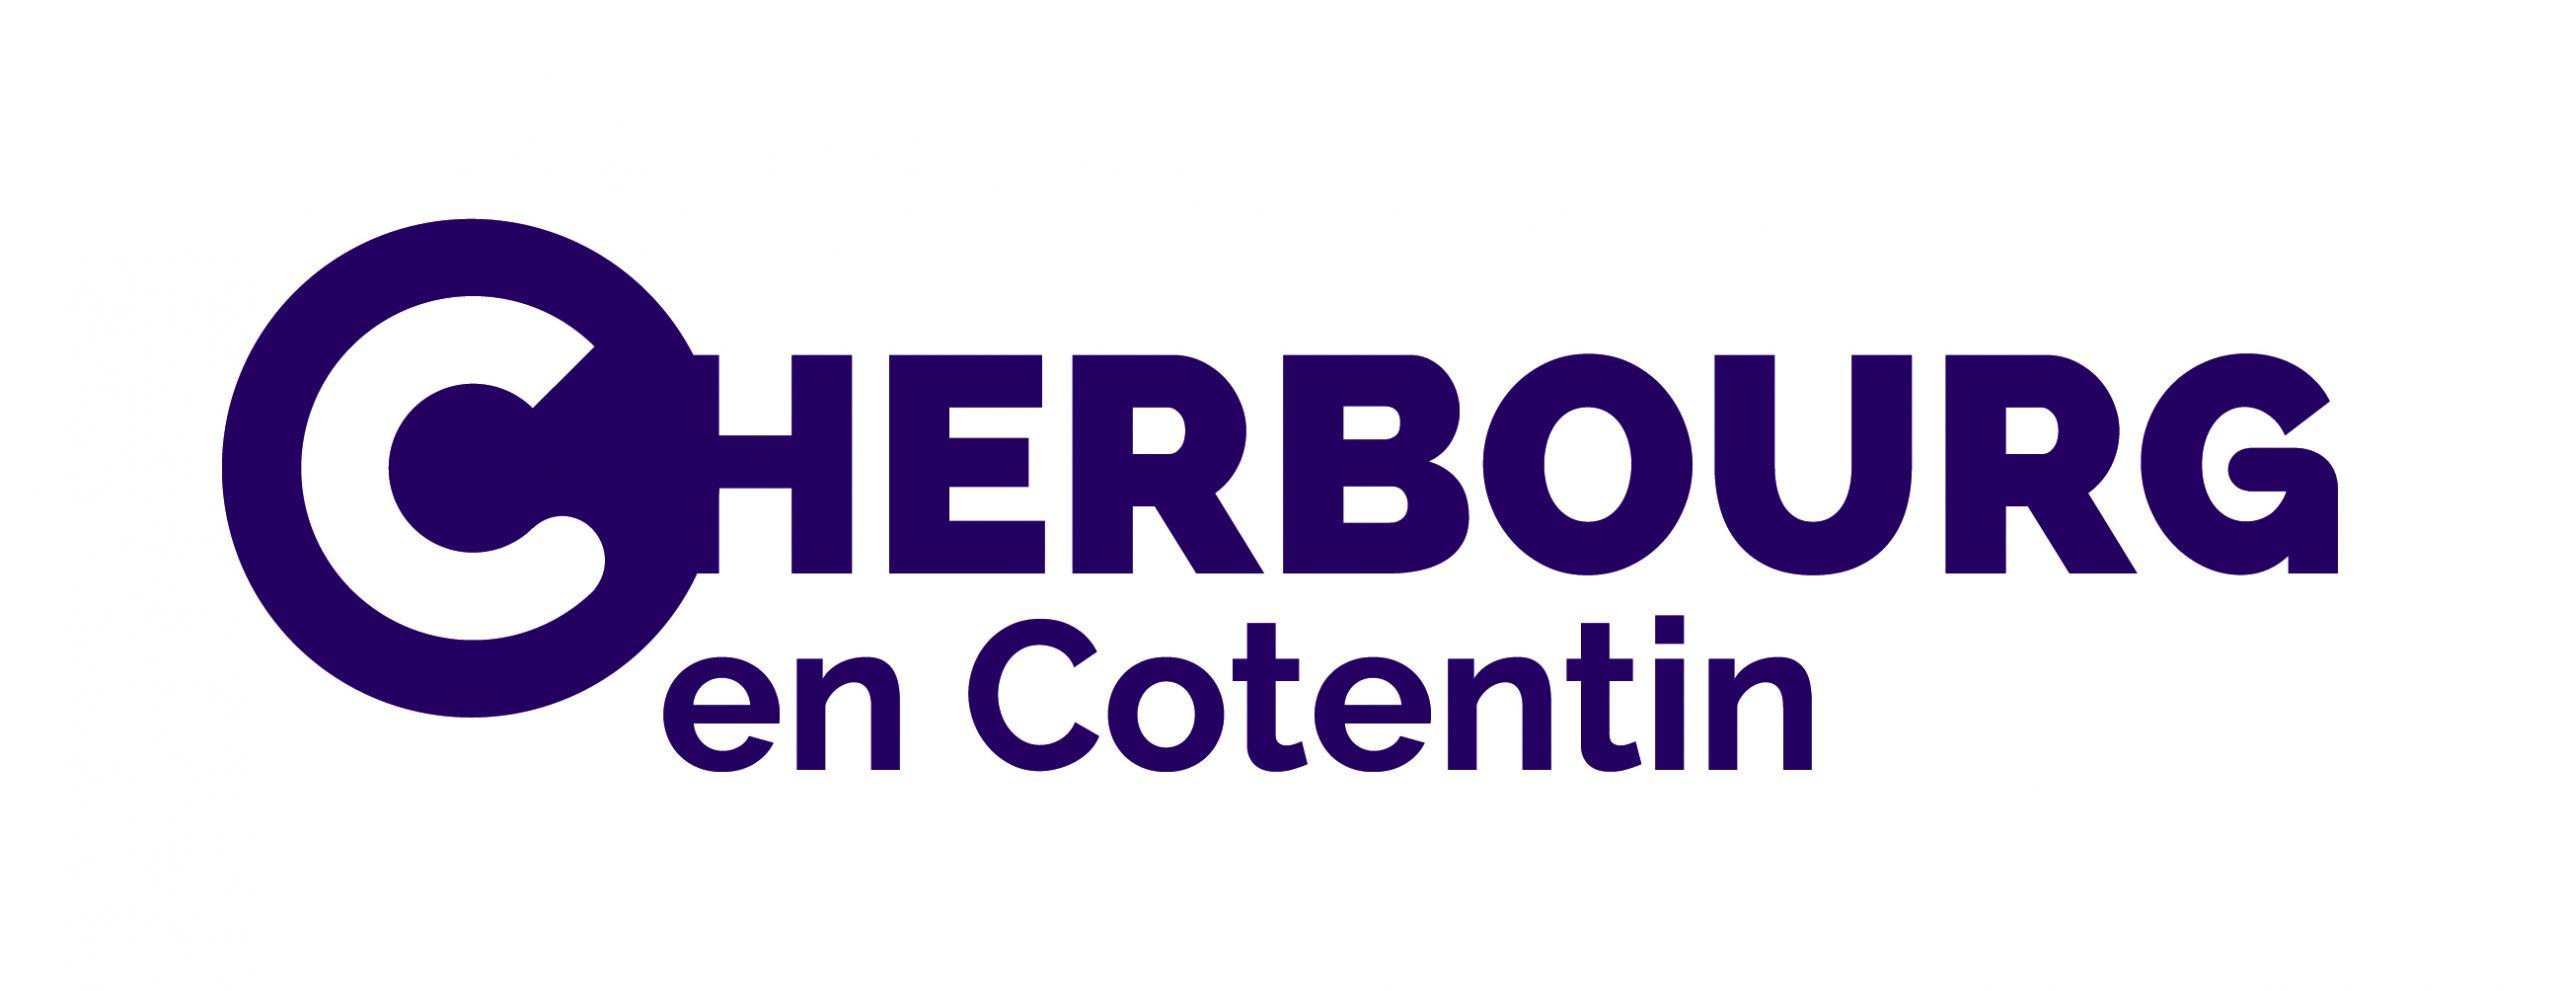 Logo Cherbourg en cotentin